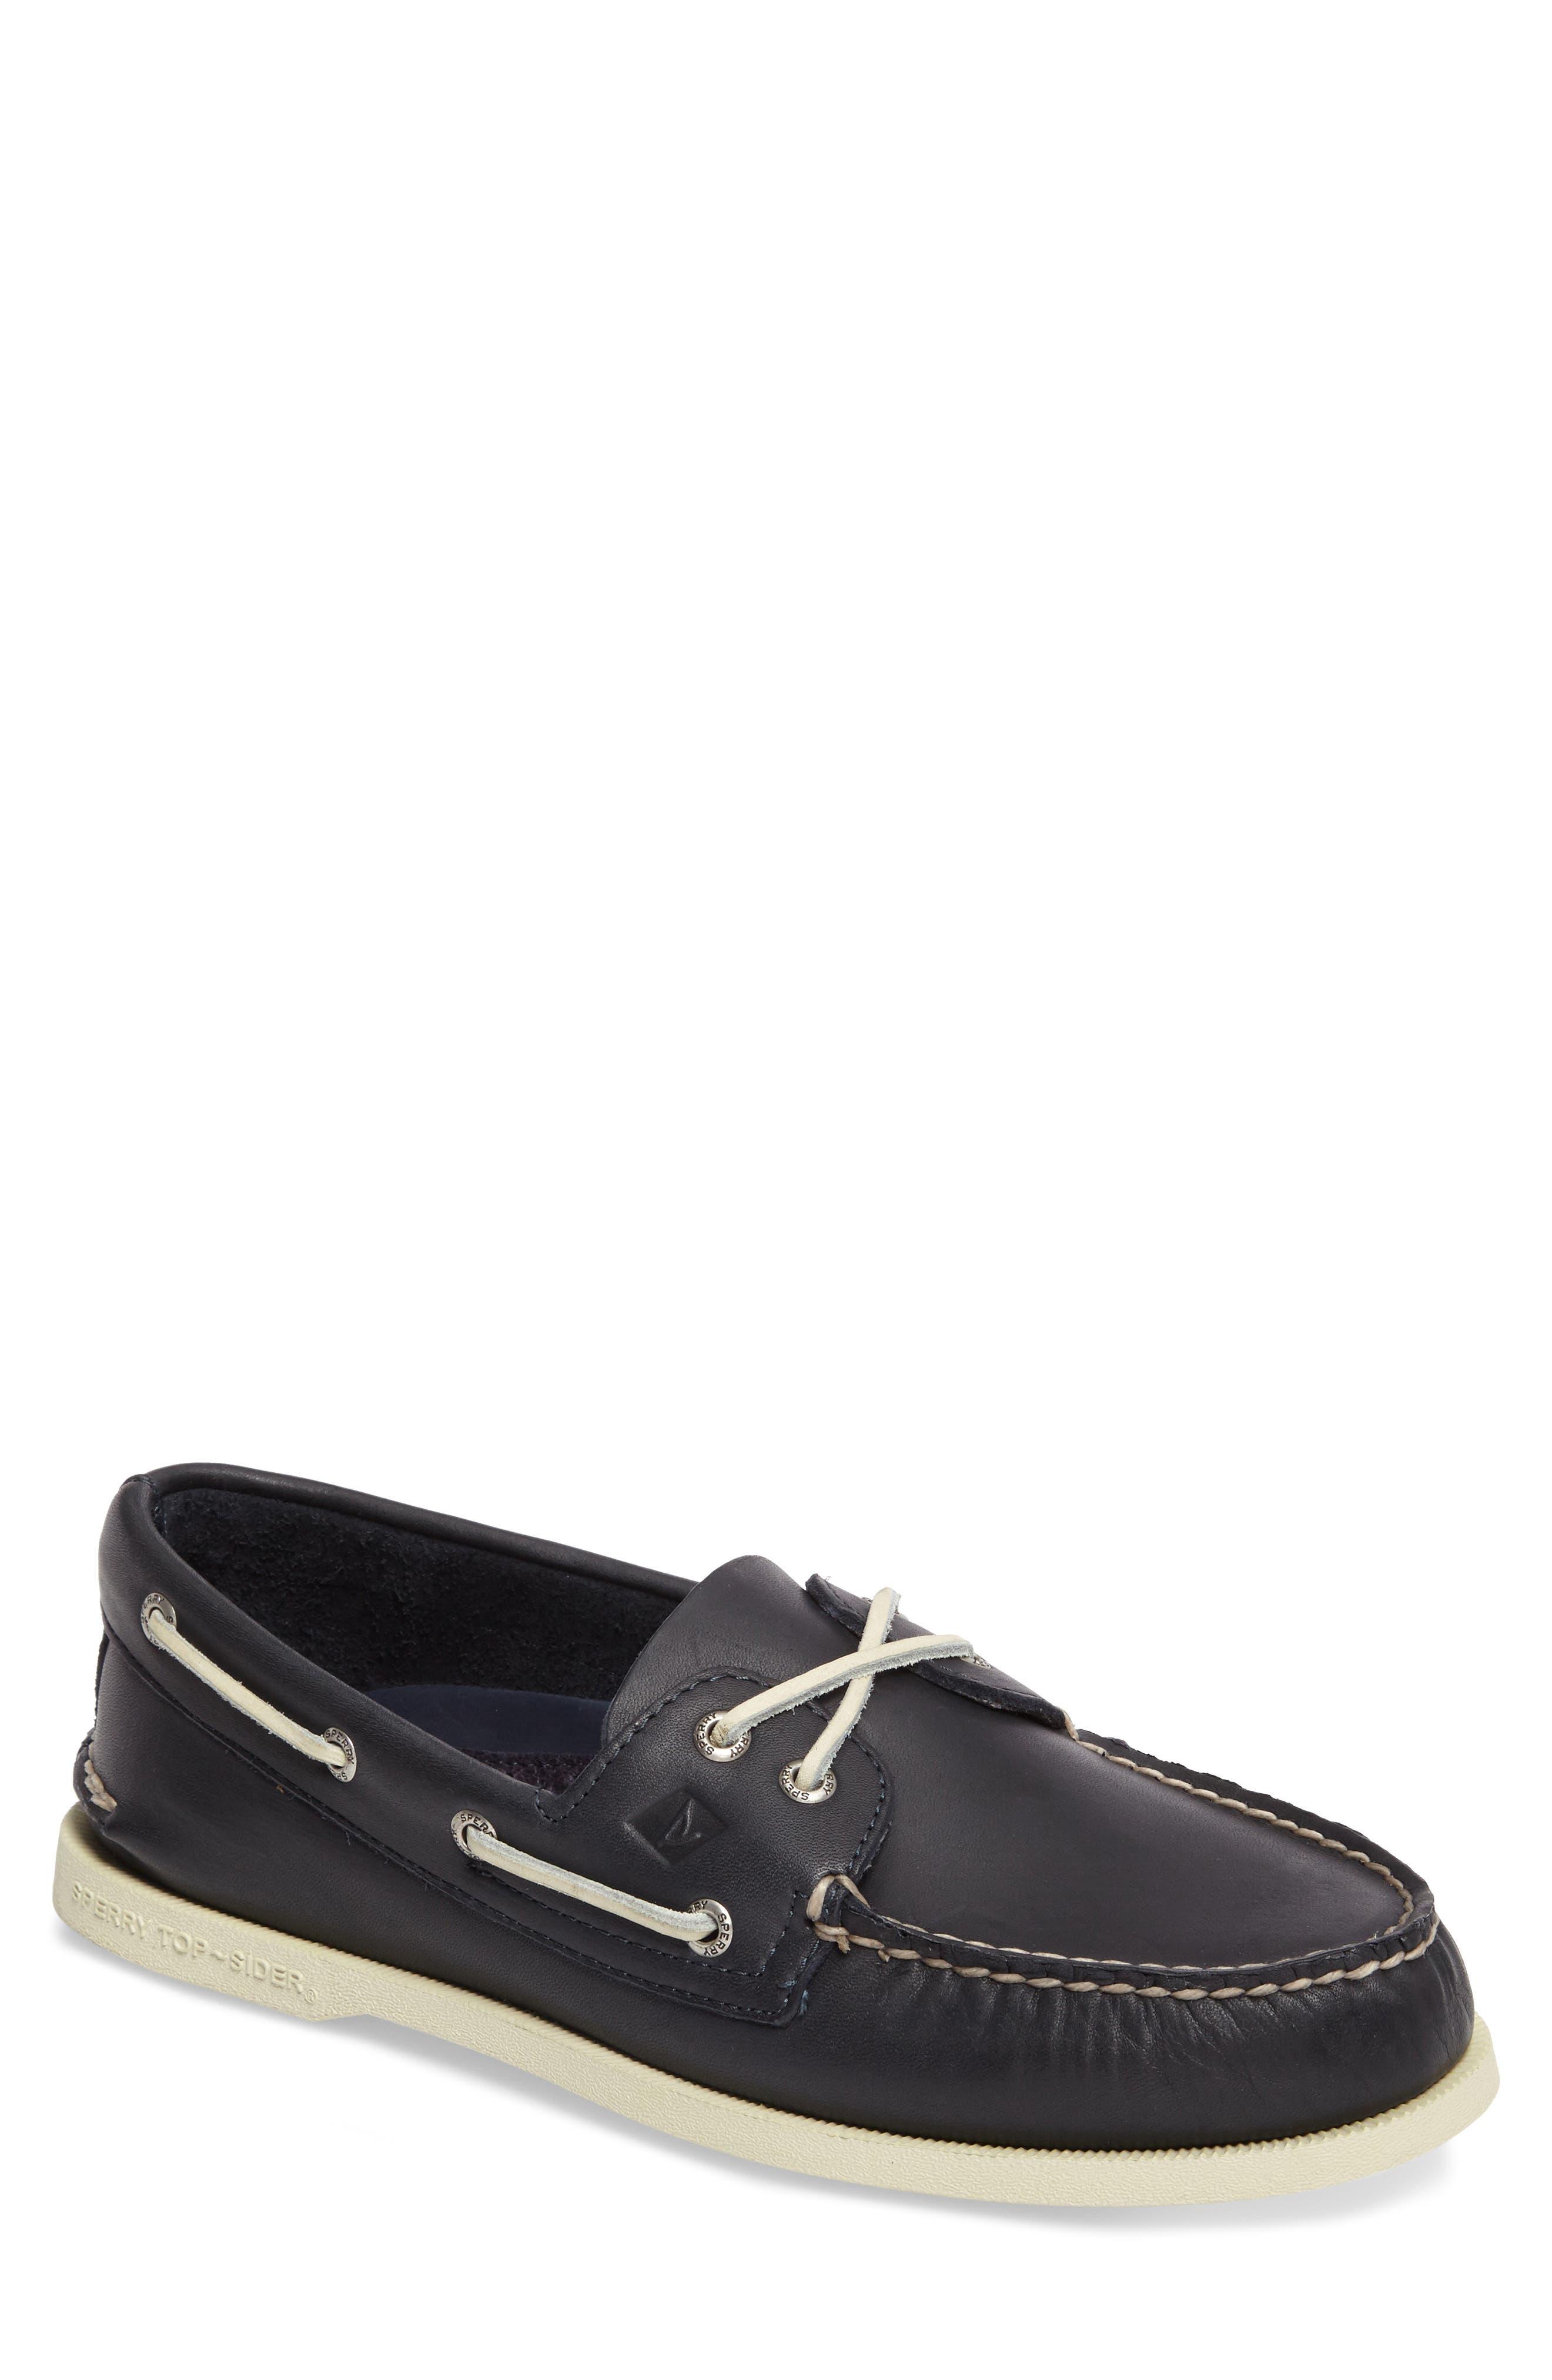 SPERRY Authentic Original Boat Shoe, Main, color, NAVY